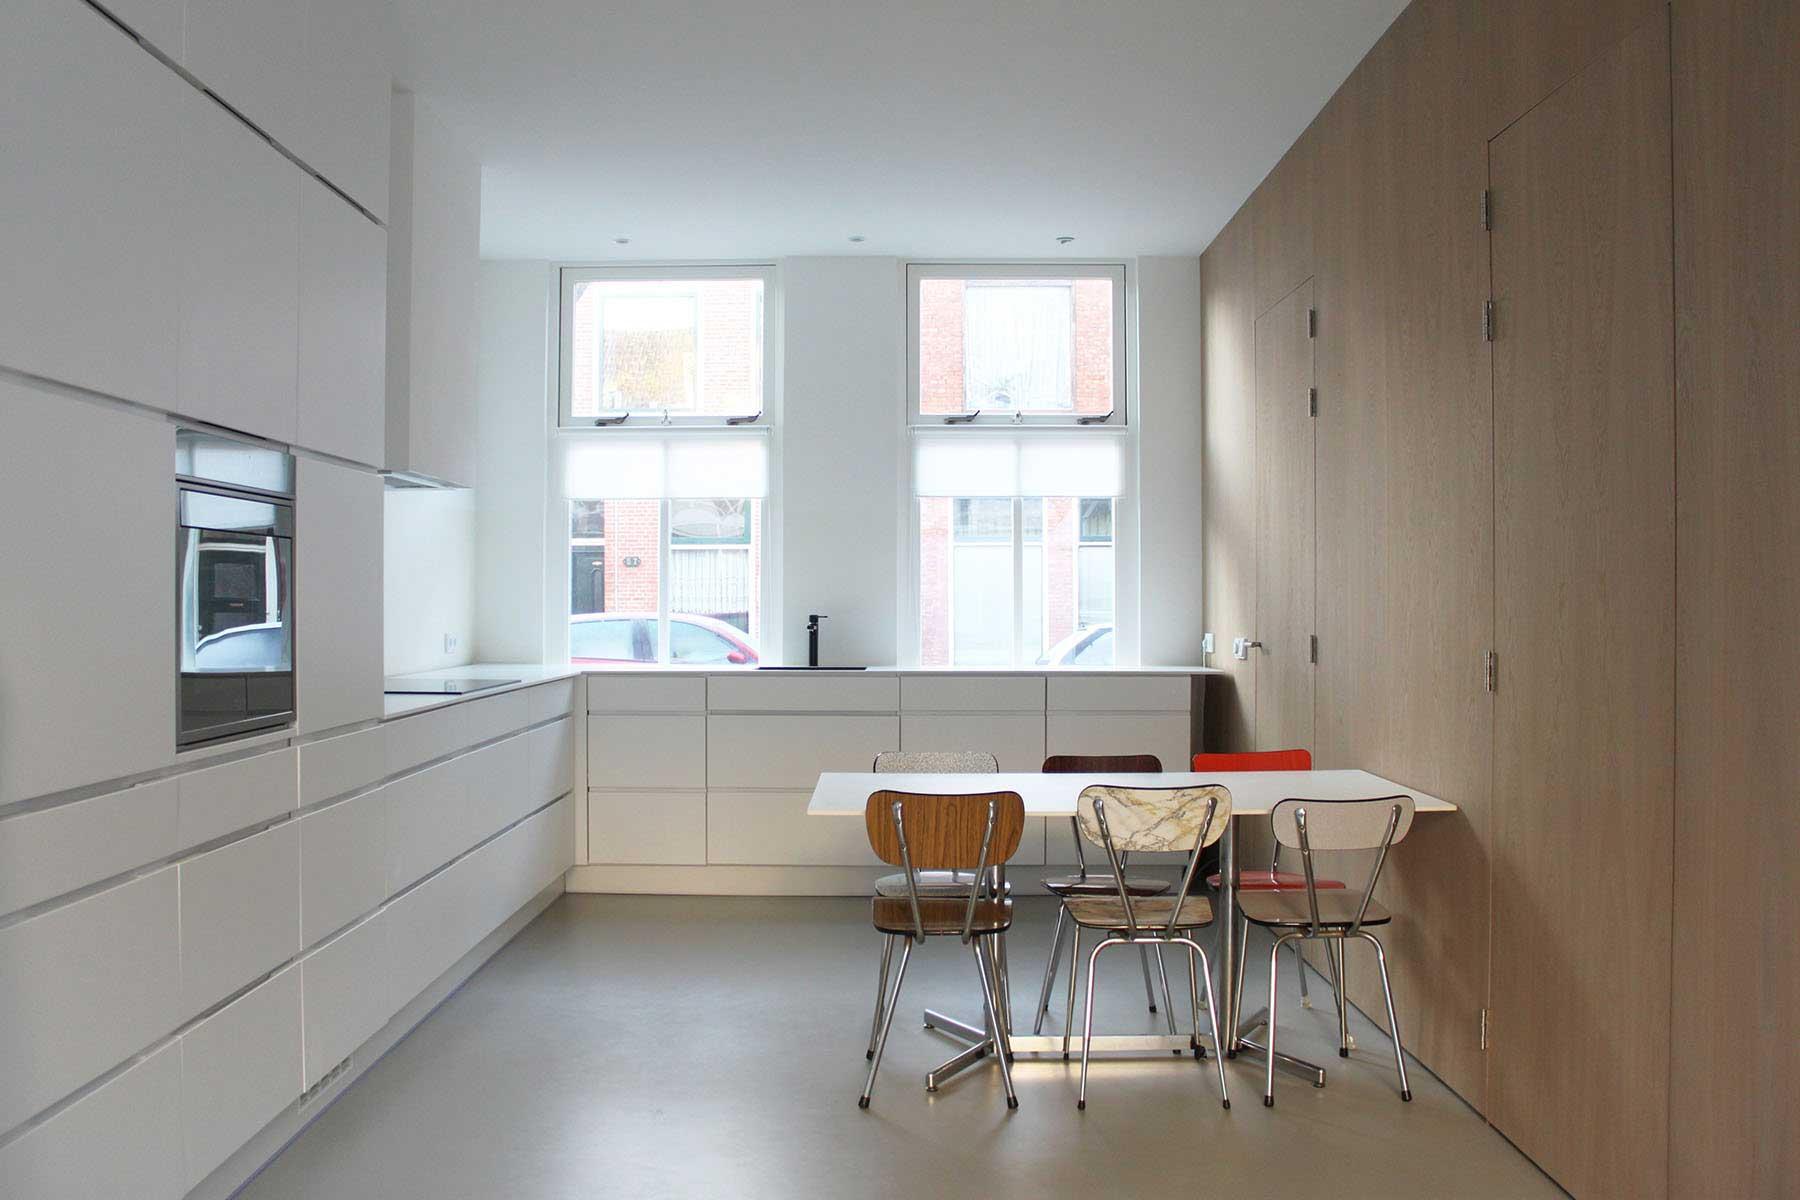 8A-Architecten-verbouwing-arbeiderswoning-05